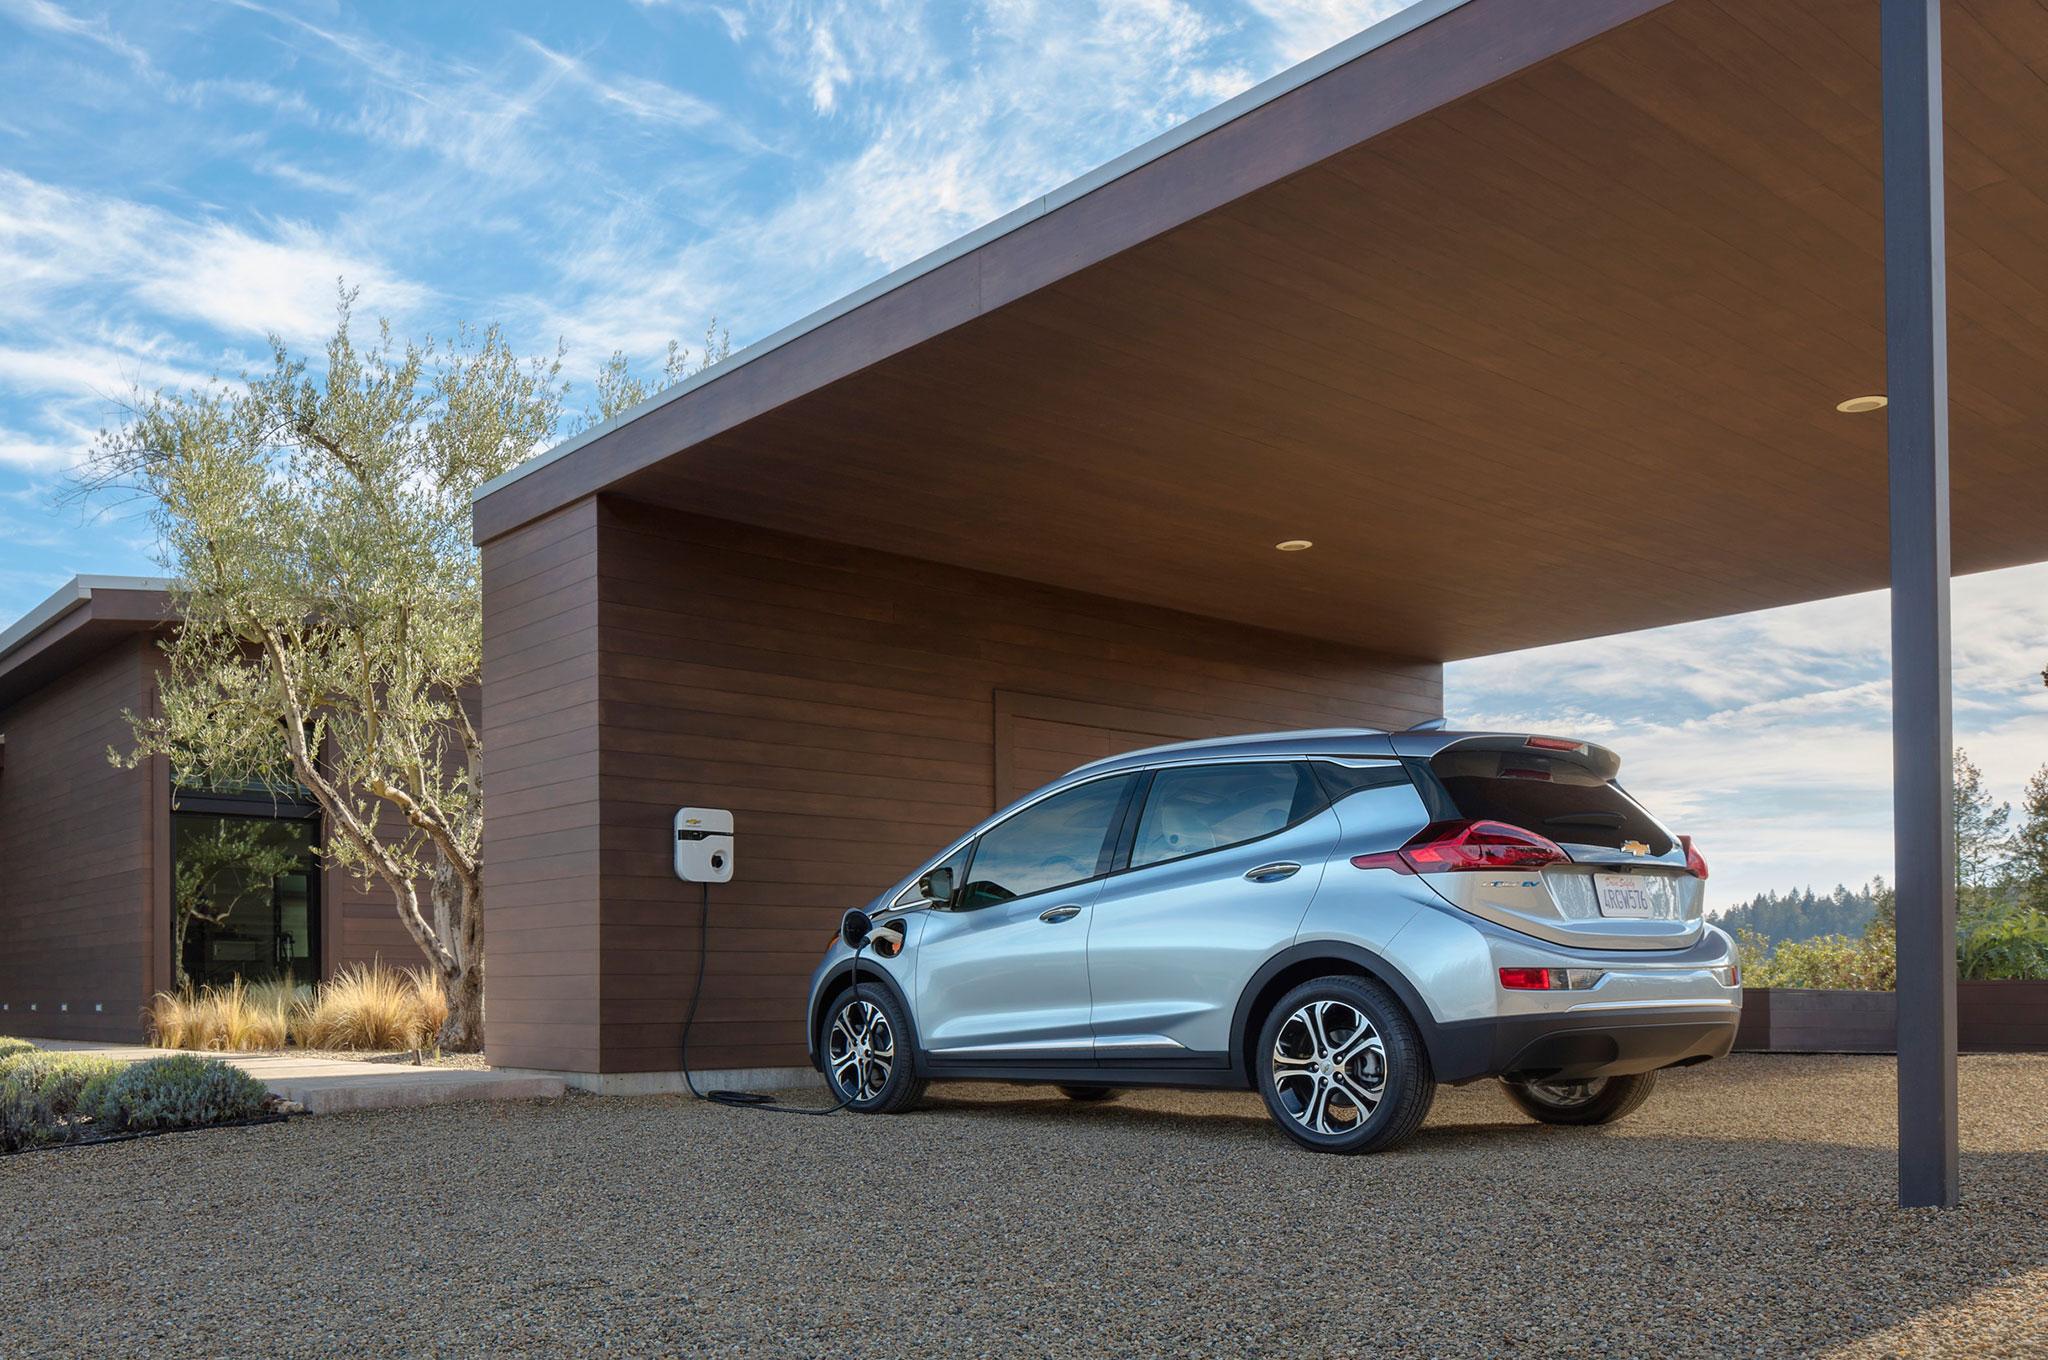 2017 Chevrolet Bolt EV 10